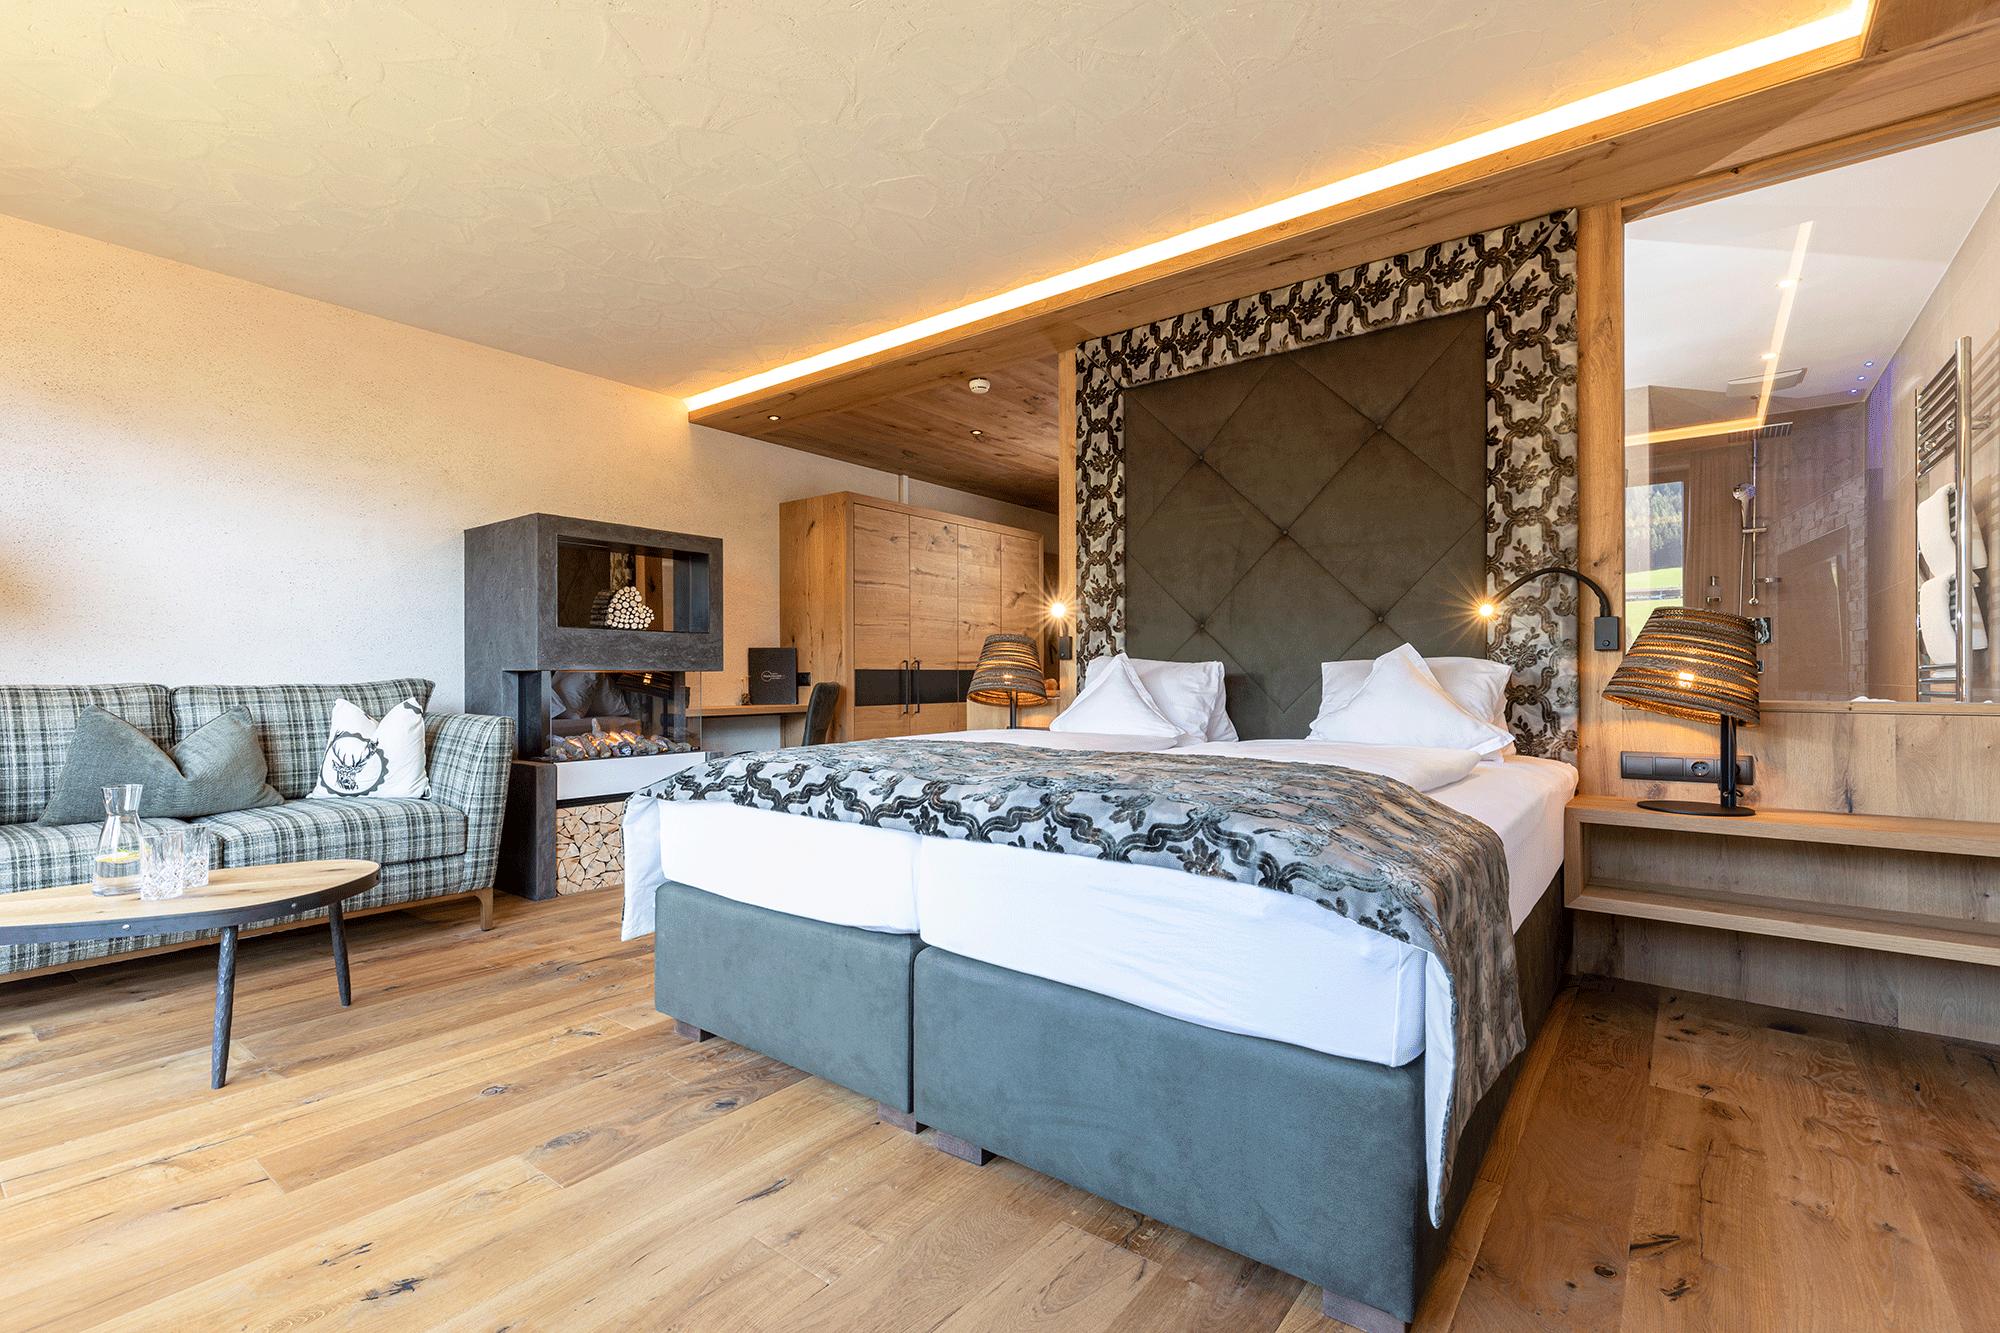 Wohnkomfortzimmer Bergzauber Bett im Wellnesshotel Alpbacherhof im Alpbachtal